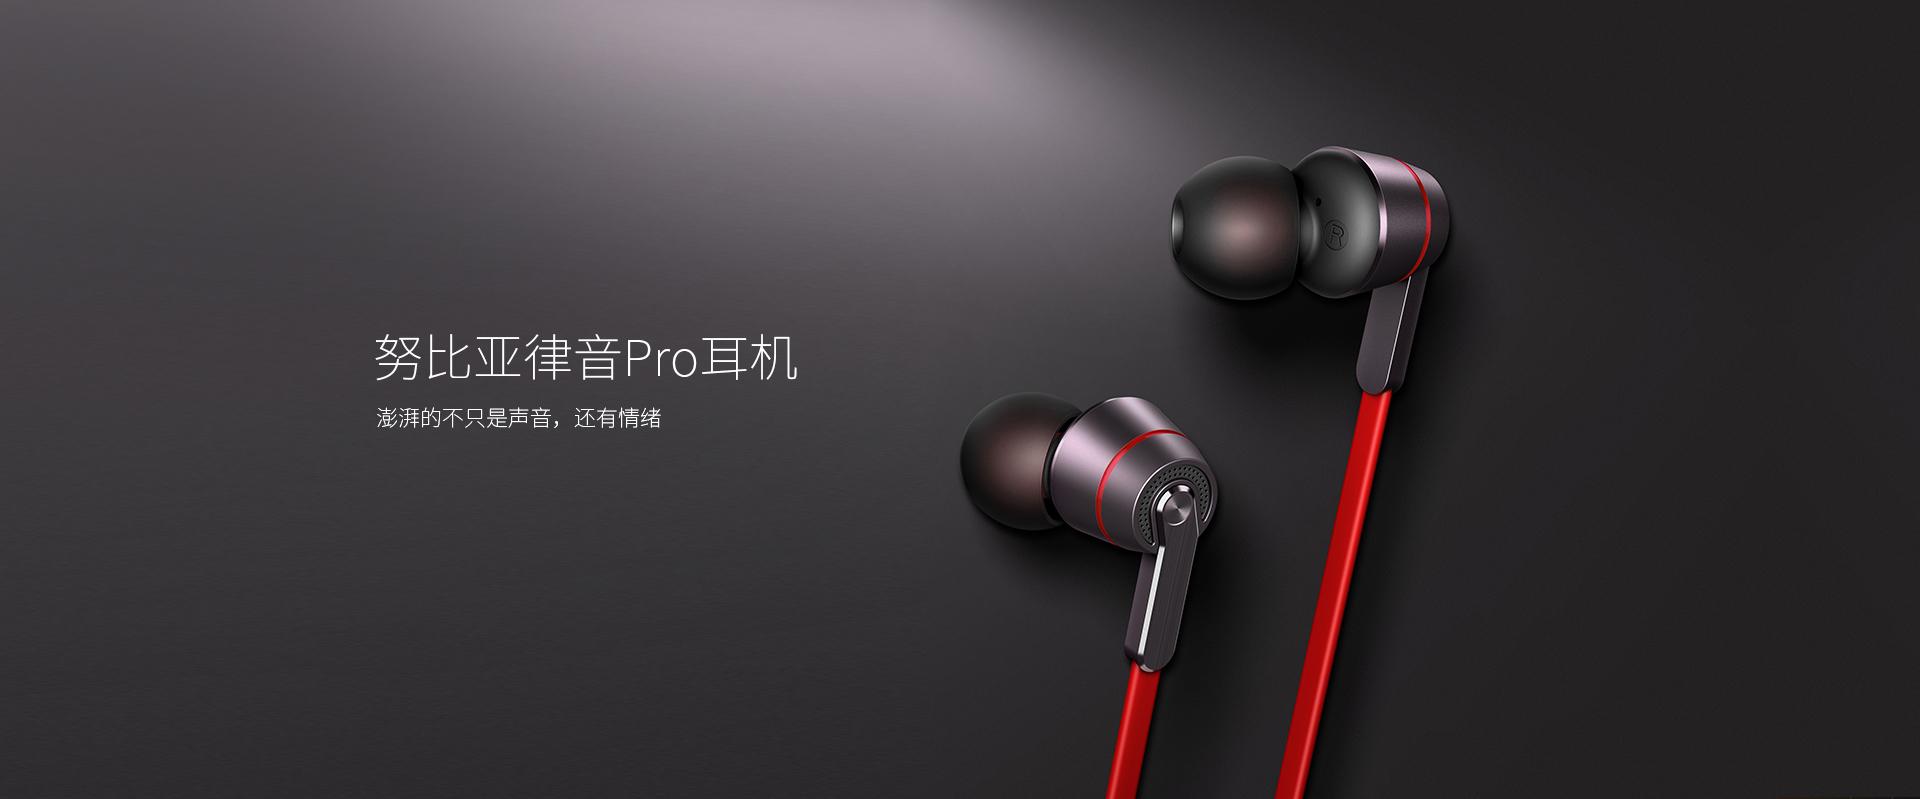 OnePlus 一加 银耳2 耳机 开箱(对比 nubia 努比亚 律音Pro)